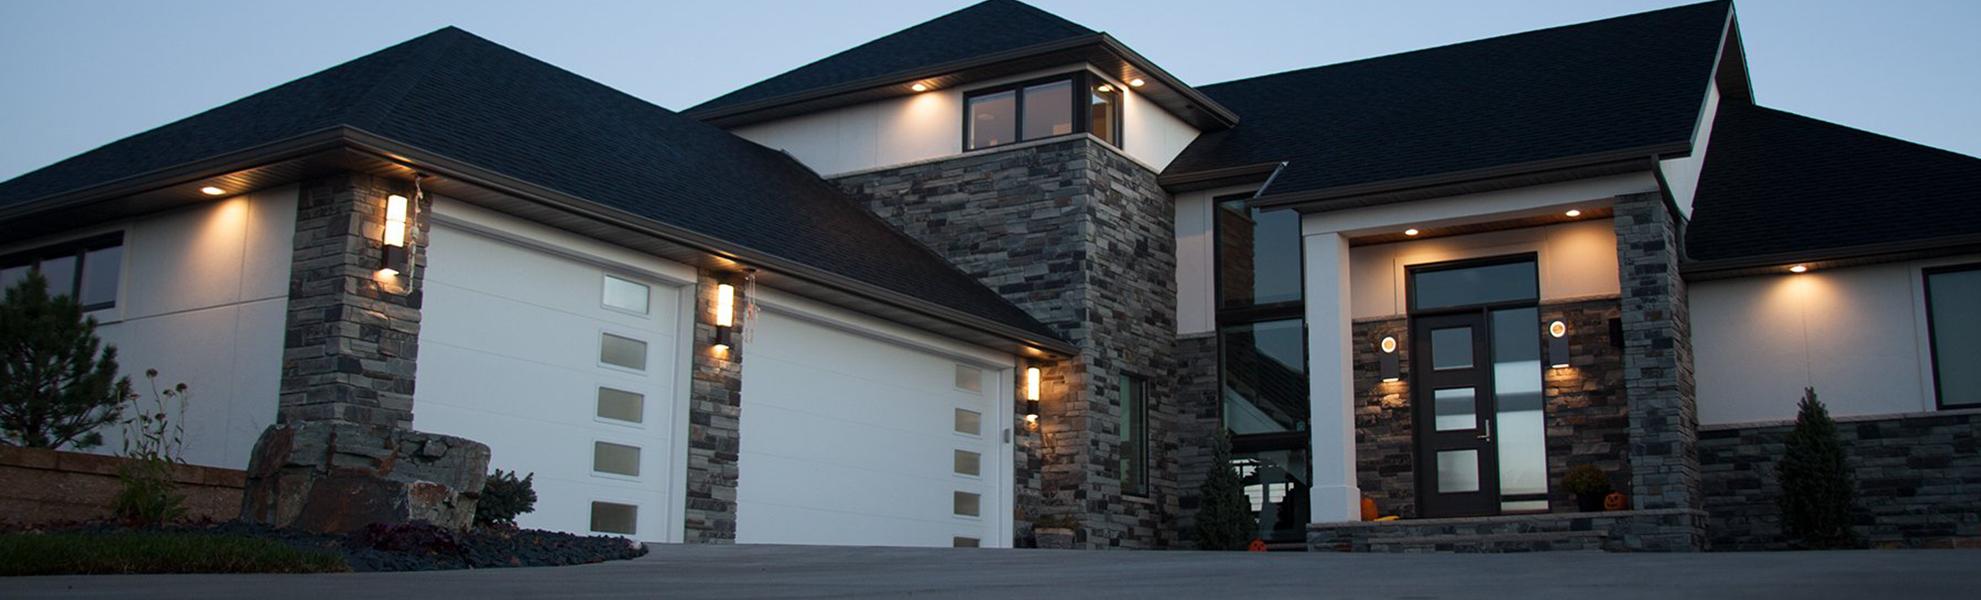 residential garage doors evanston il